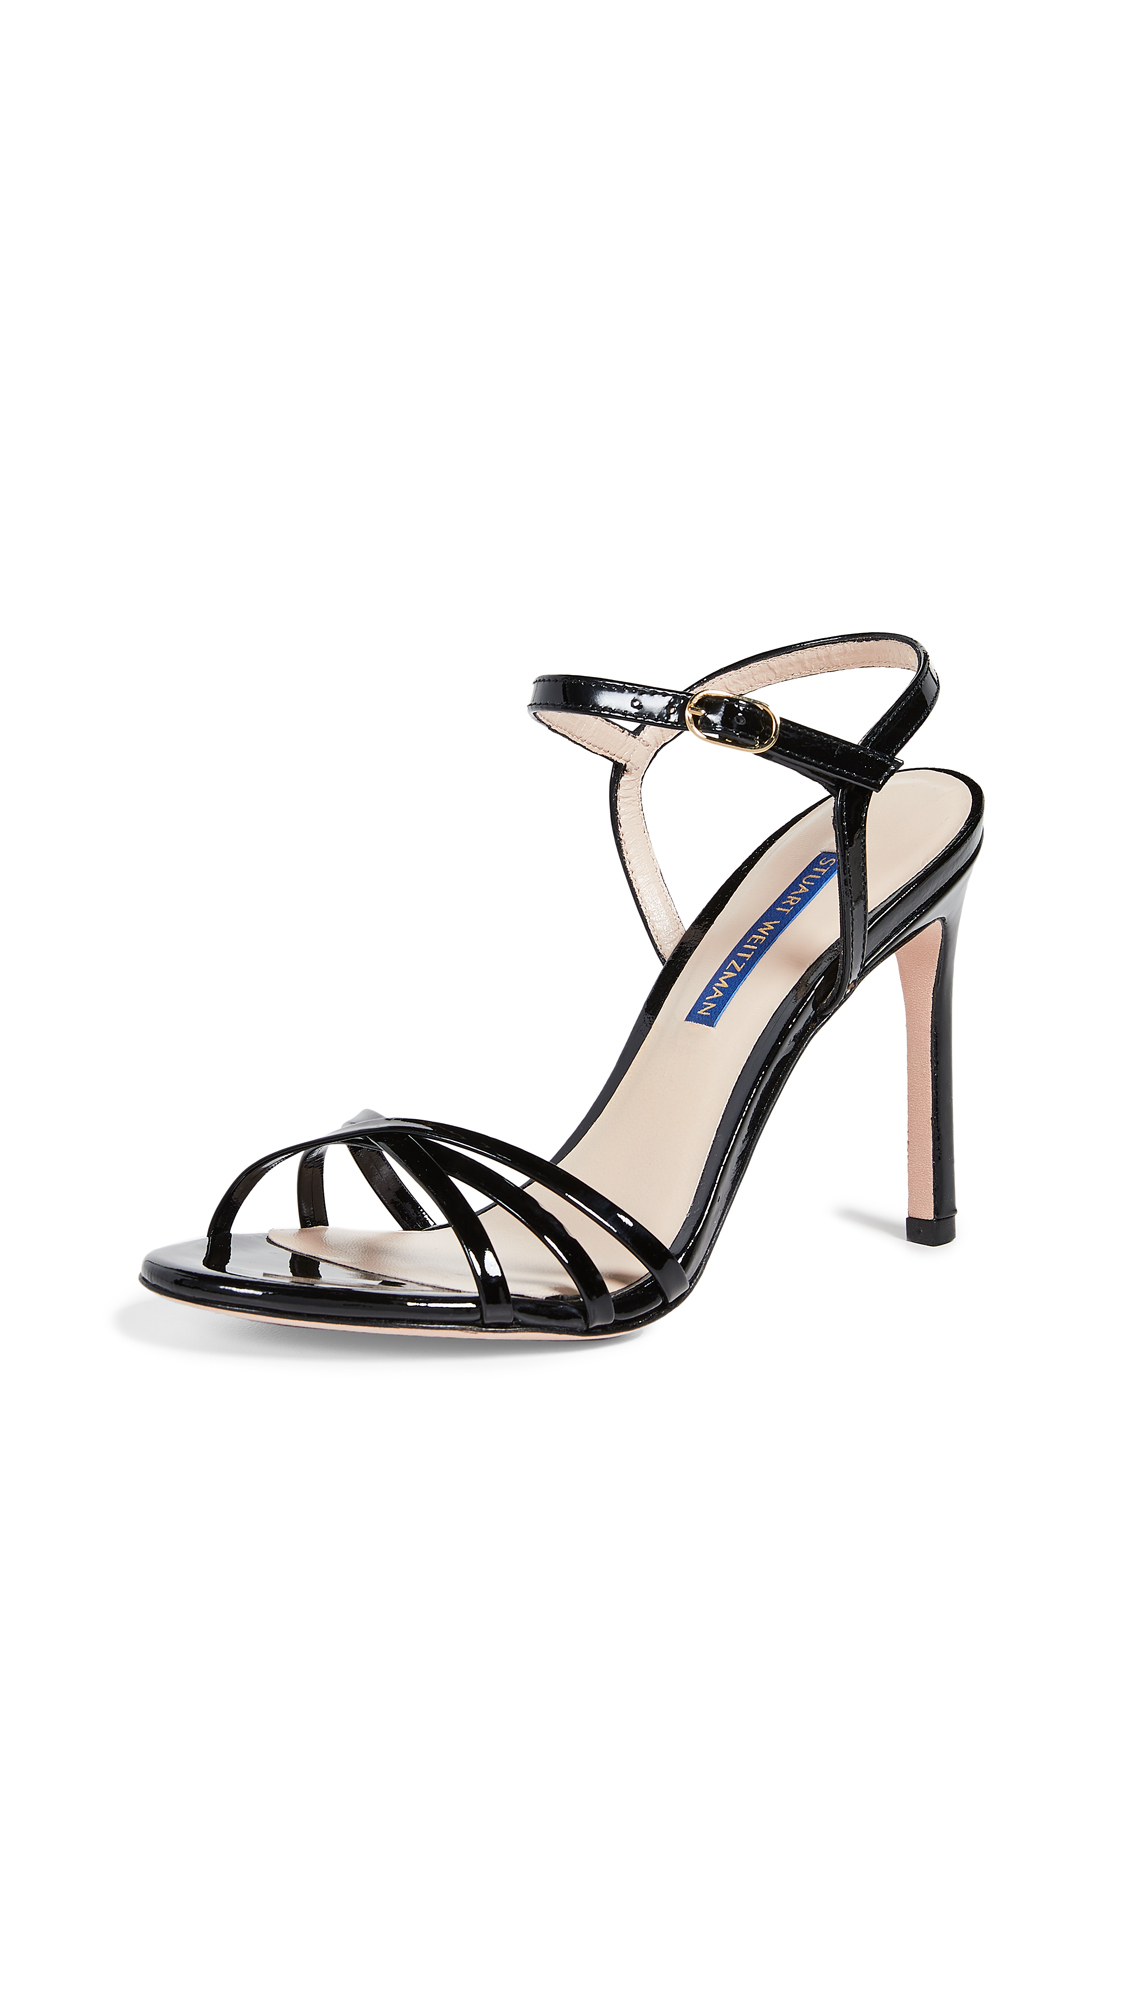 Stuart Weitzman Starla 105 Sandals - Black